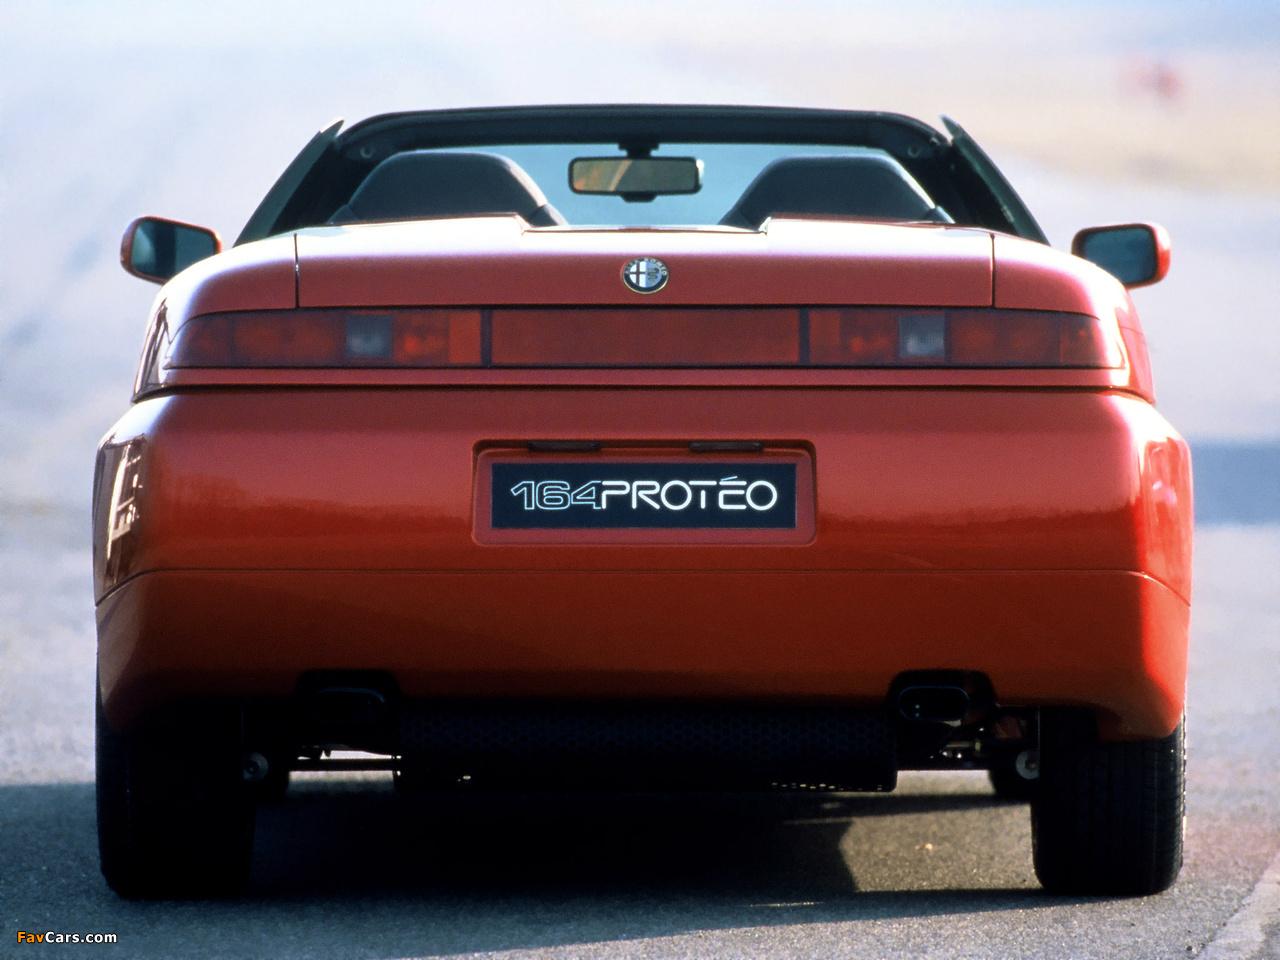 Alfa Romeo 164 Proteo Concept (1991) images (1280 x 960)